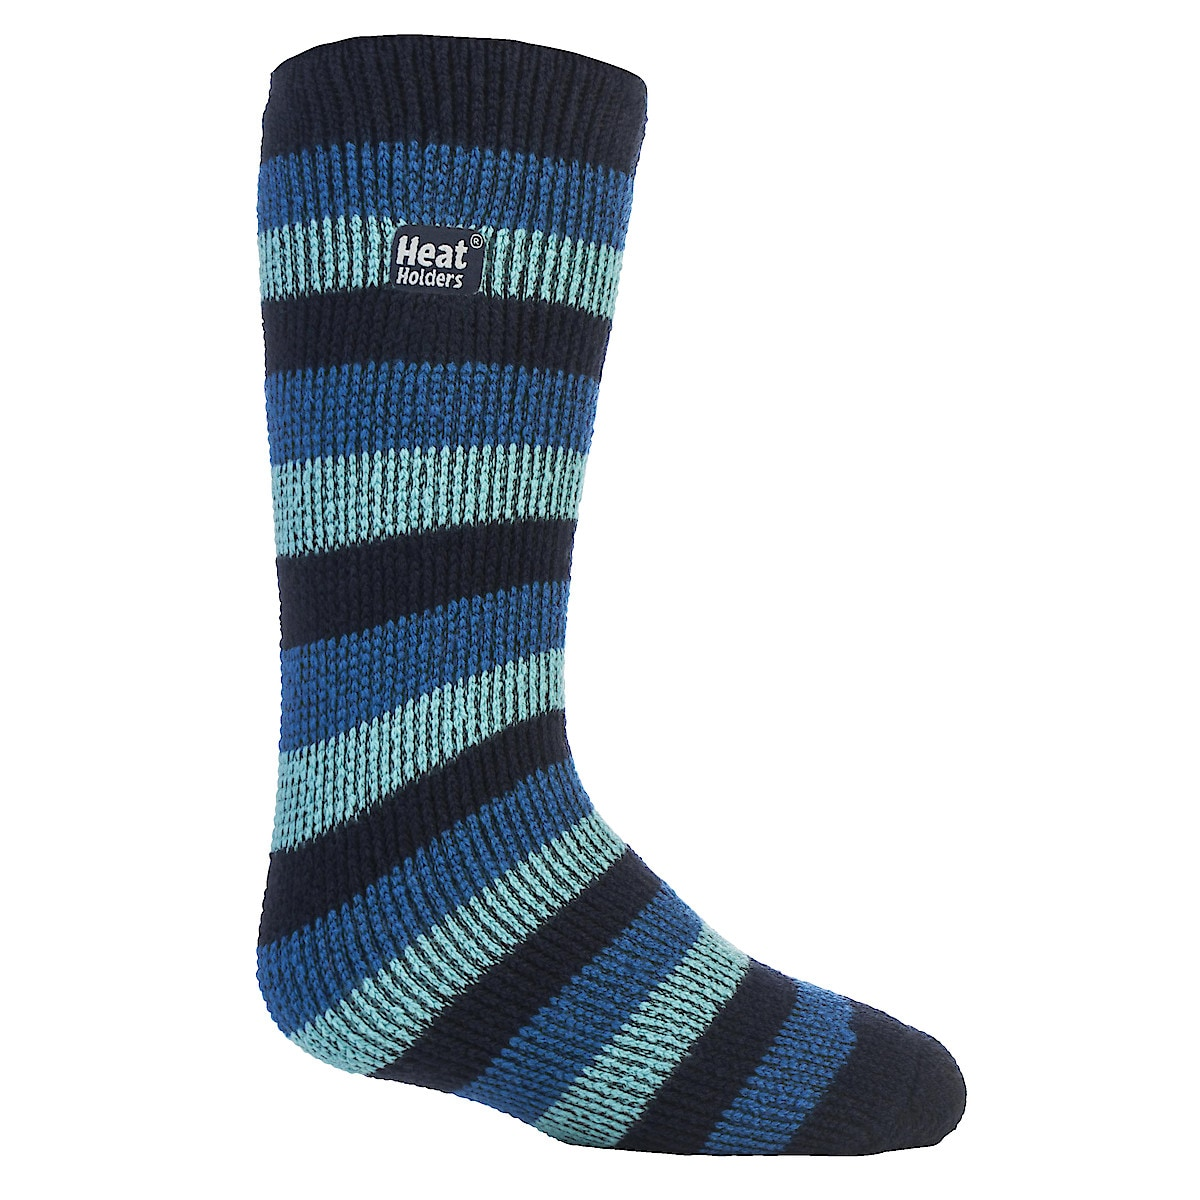 Heat Holders Thermal Socks, size 34-39